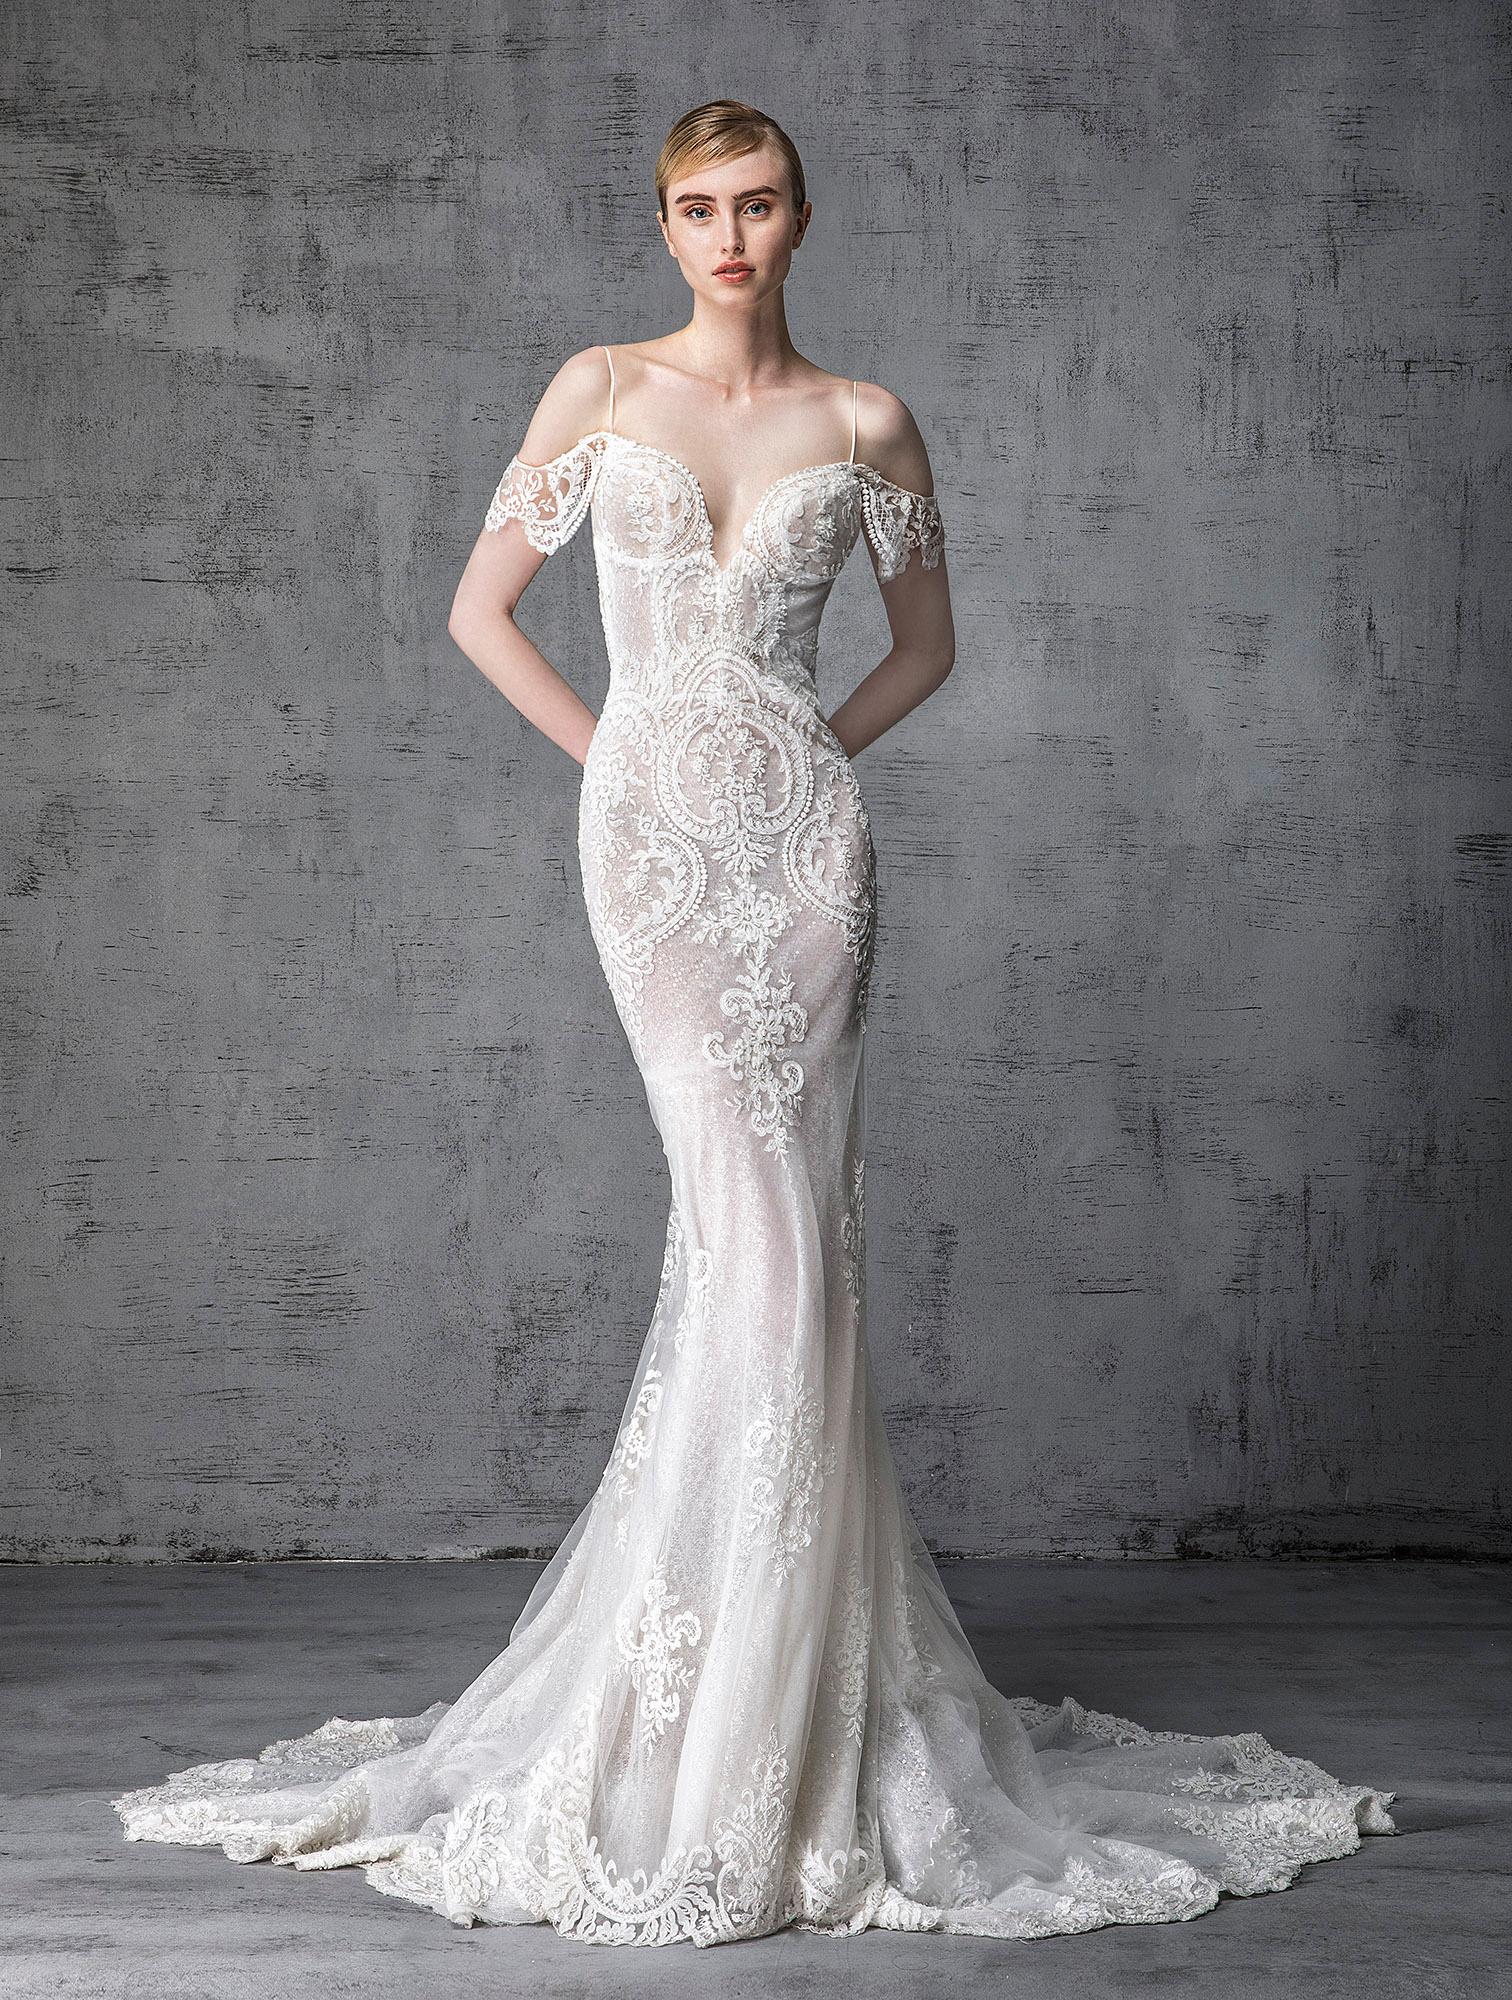 victoria kyriakides wedding dress spring 2019 spaghetti-strap off-the-shoulder